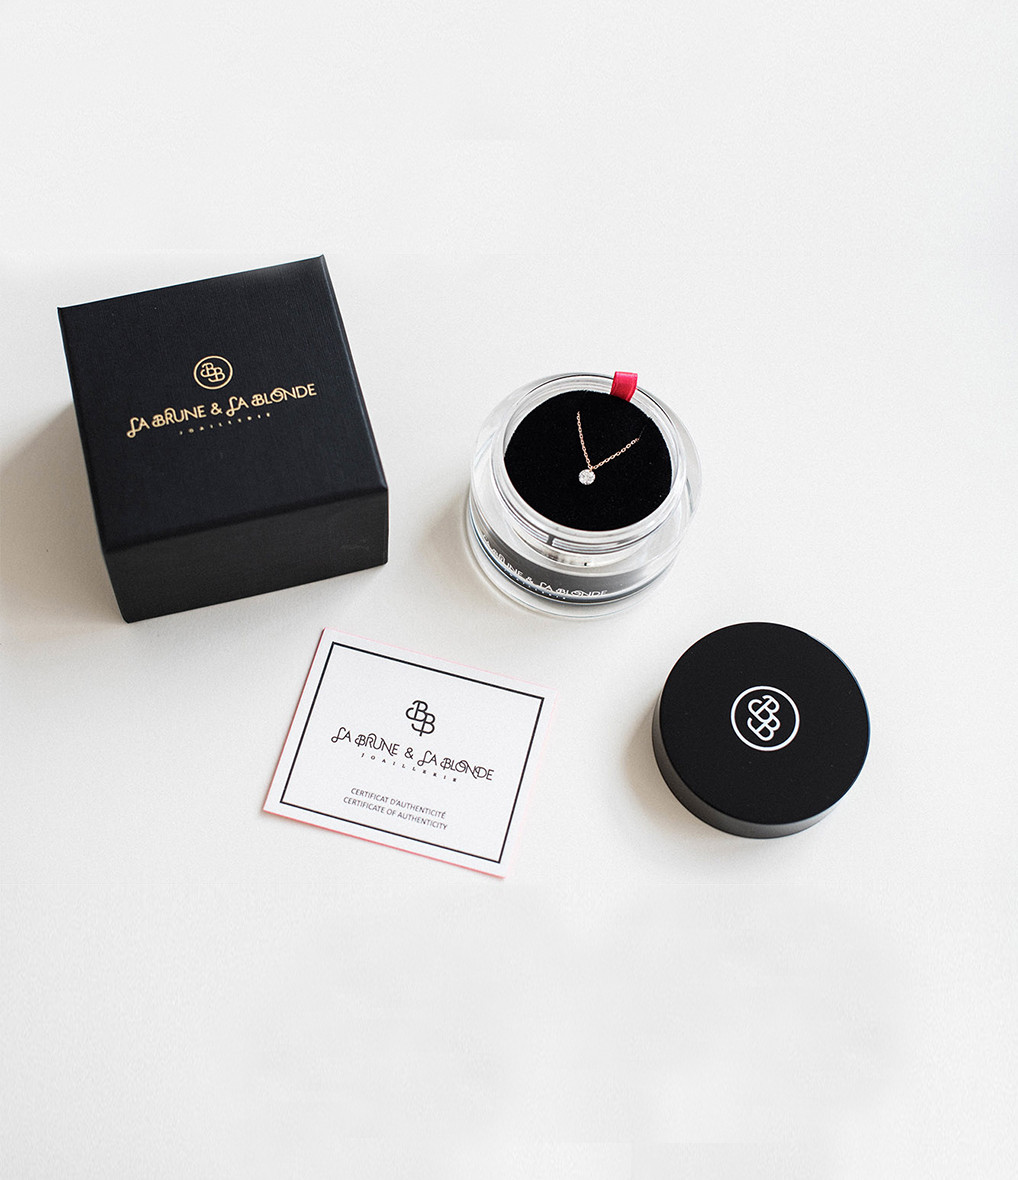 LA BRUNE & LA BLONDE - Créoles Confetti Saphir Jaune Or Jaune